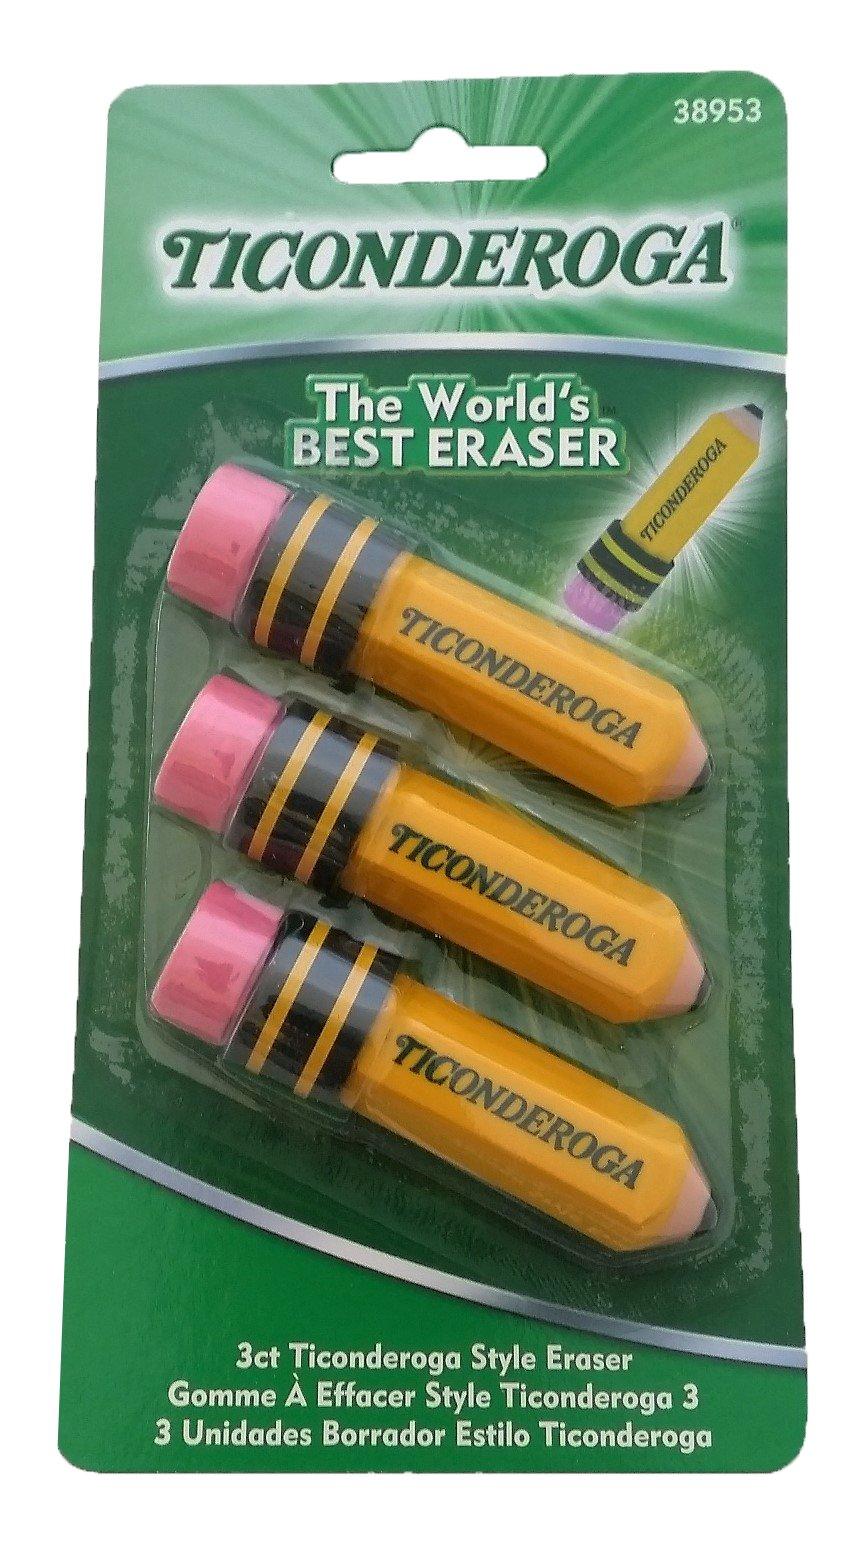 Dixon Ticonderoga Pencil Shaped Erasers 3 Pack (38953) (Set of 3) - 9 Total Erasers